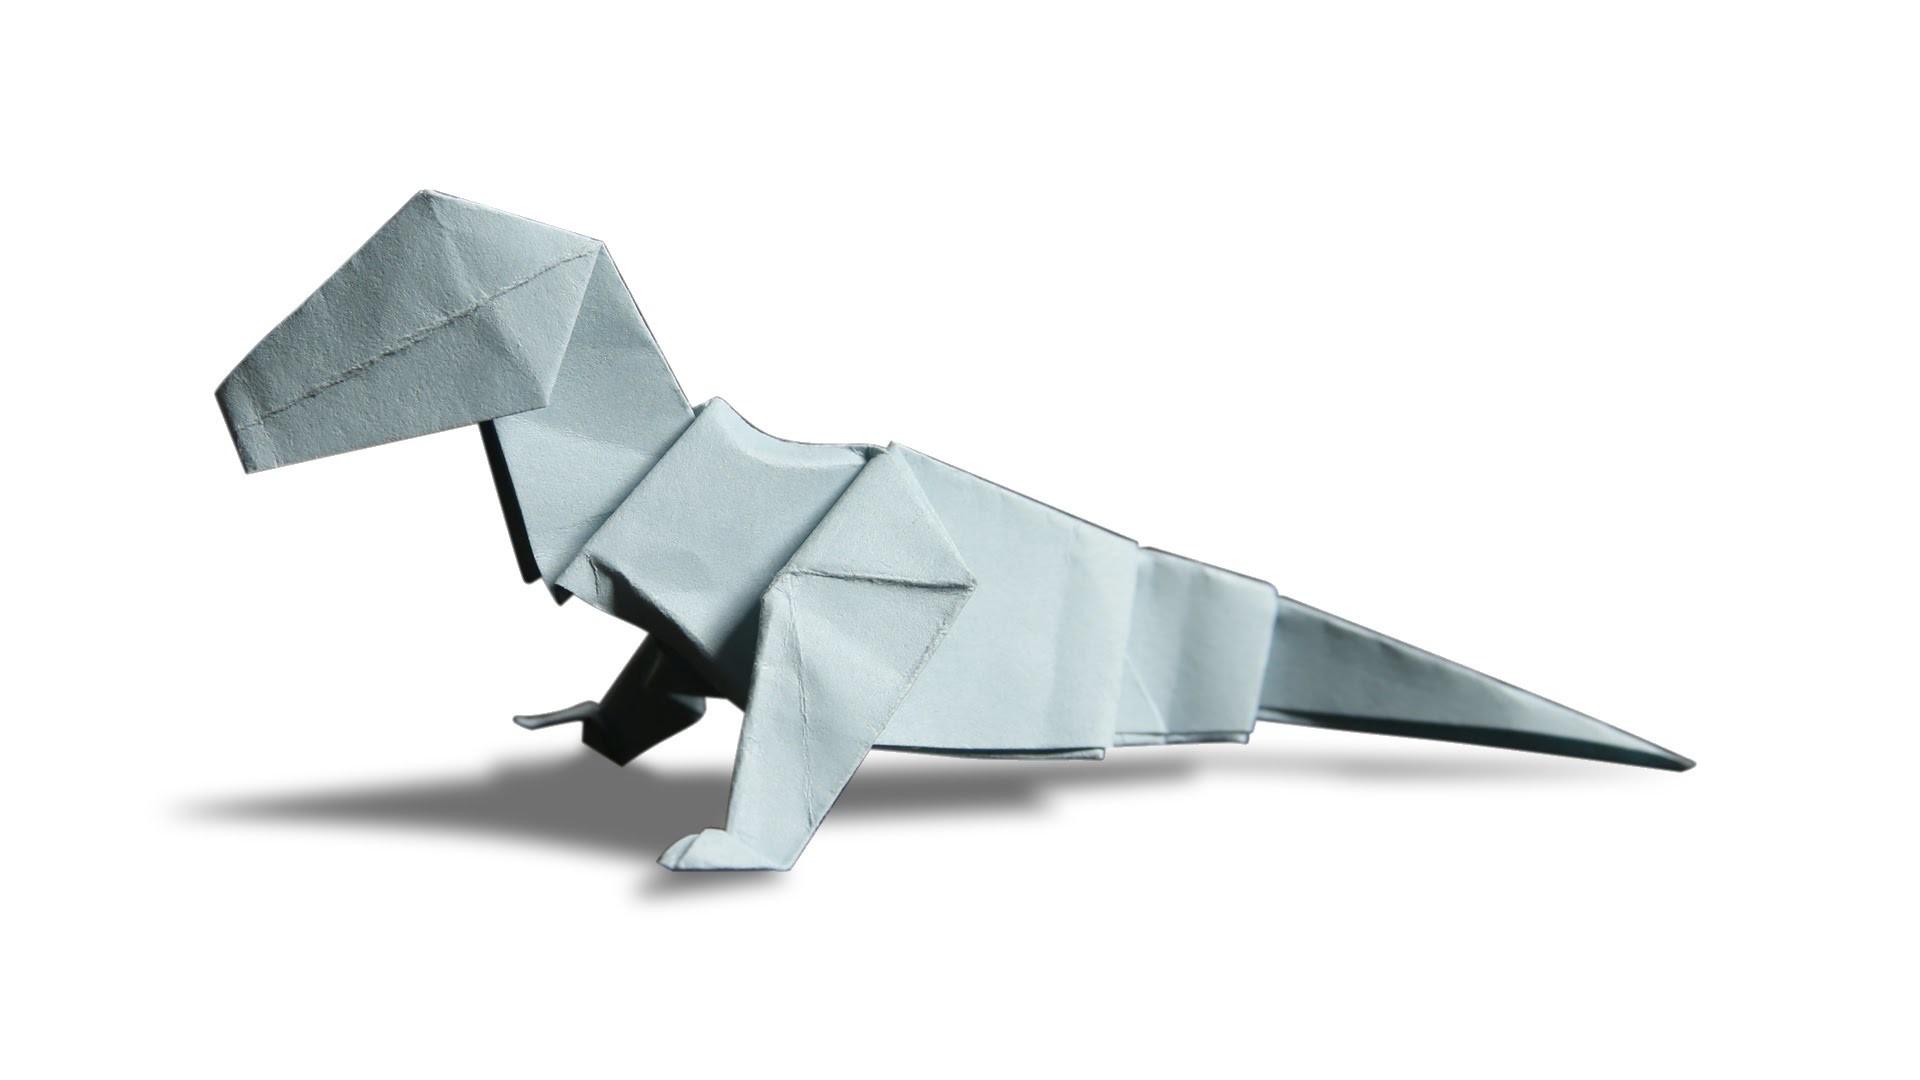 3D Origami Dinosaur DIY Learn How To Make Easy